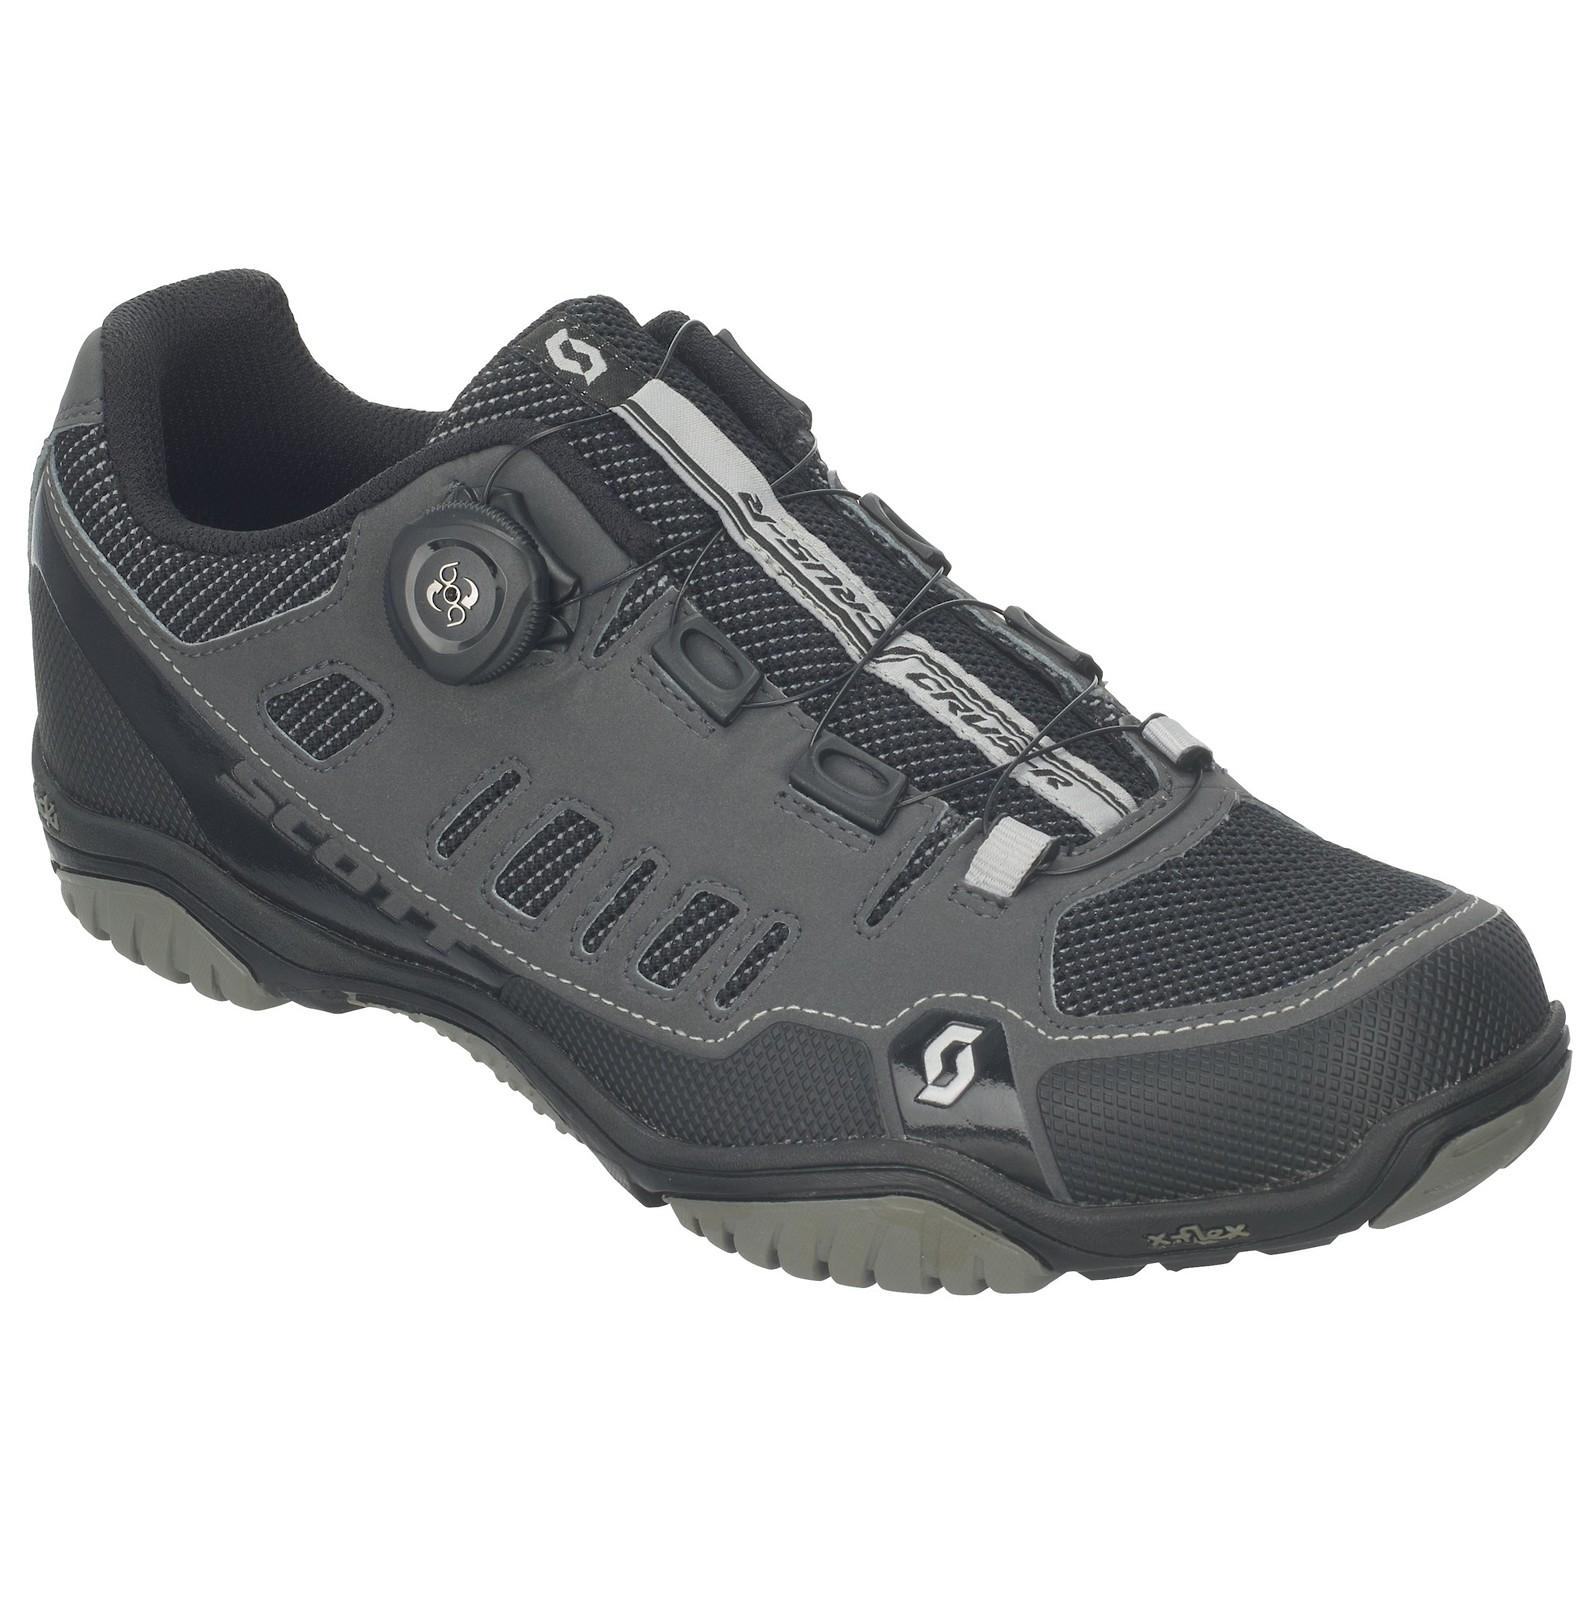 Scott Sport Crus-r Boa shoe in anthracite/black